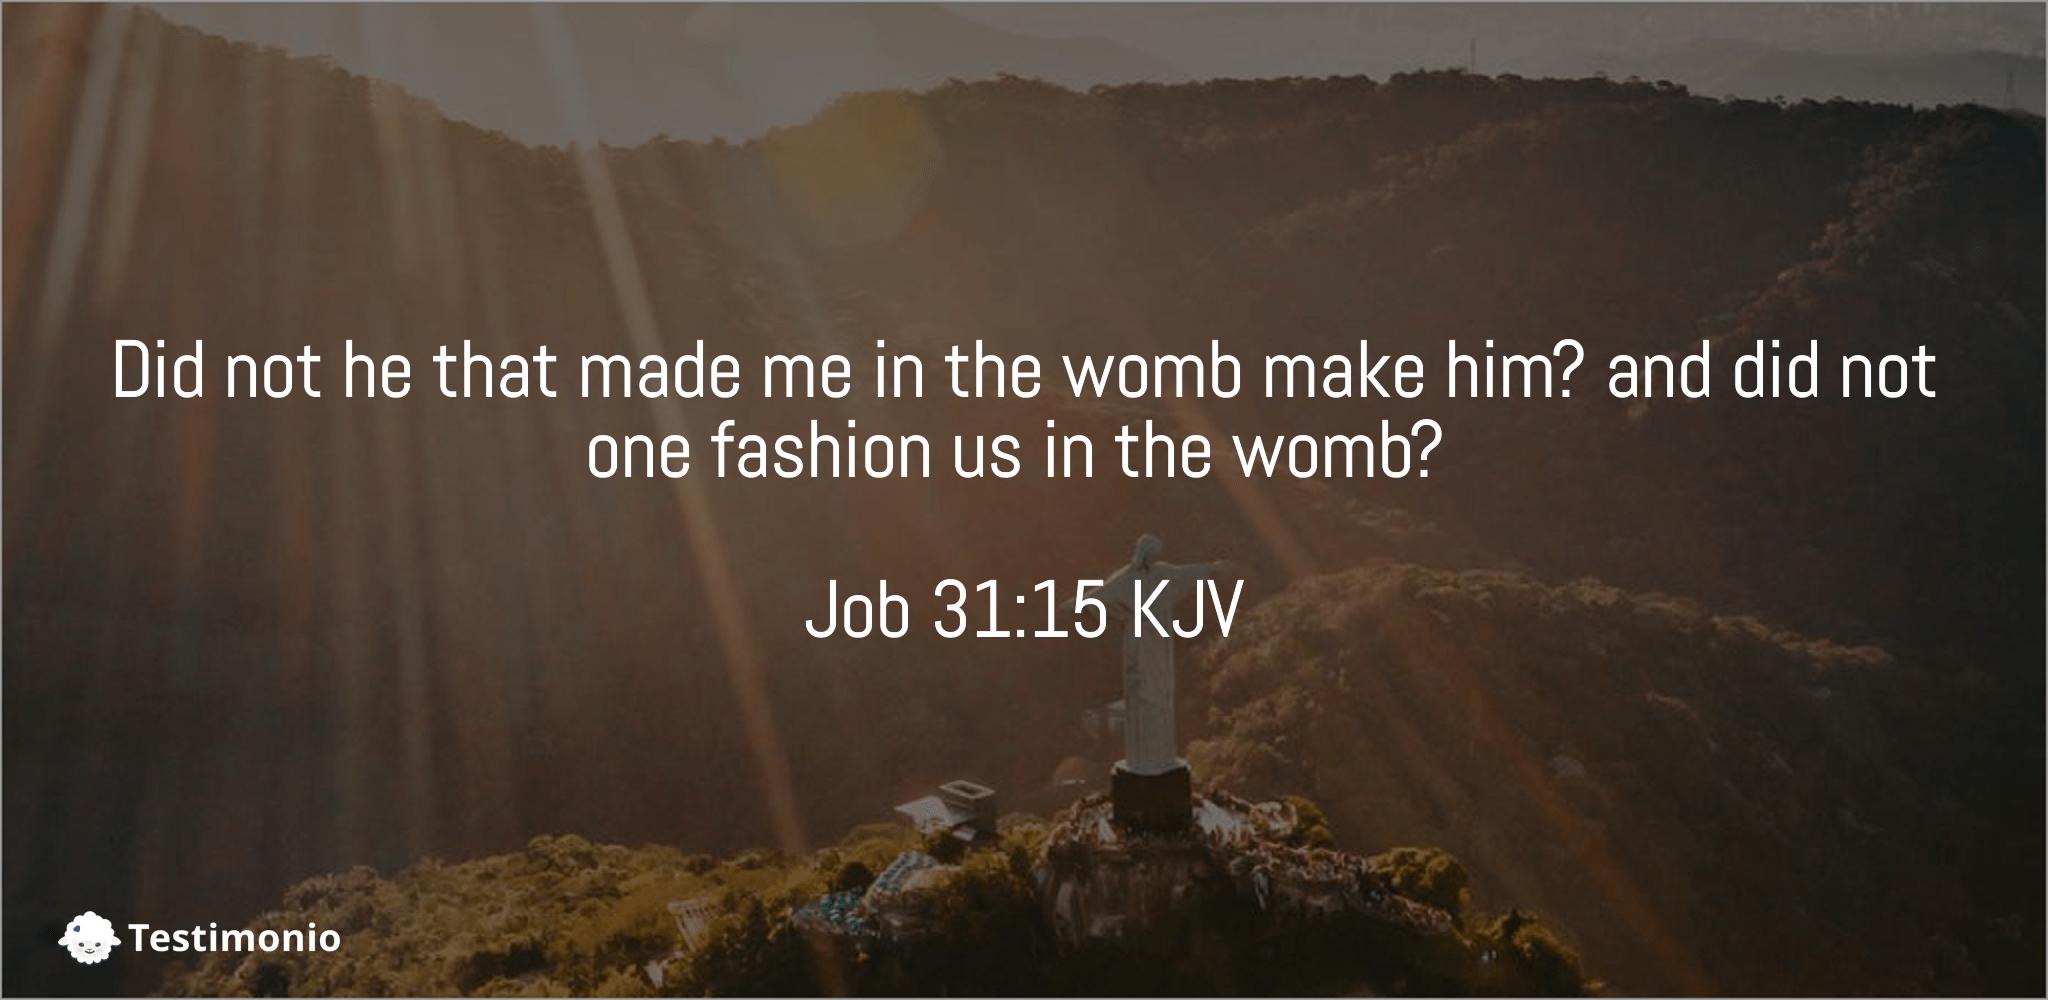 Job 31:15